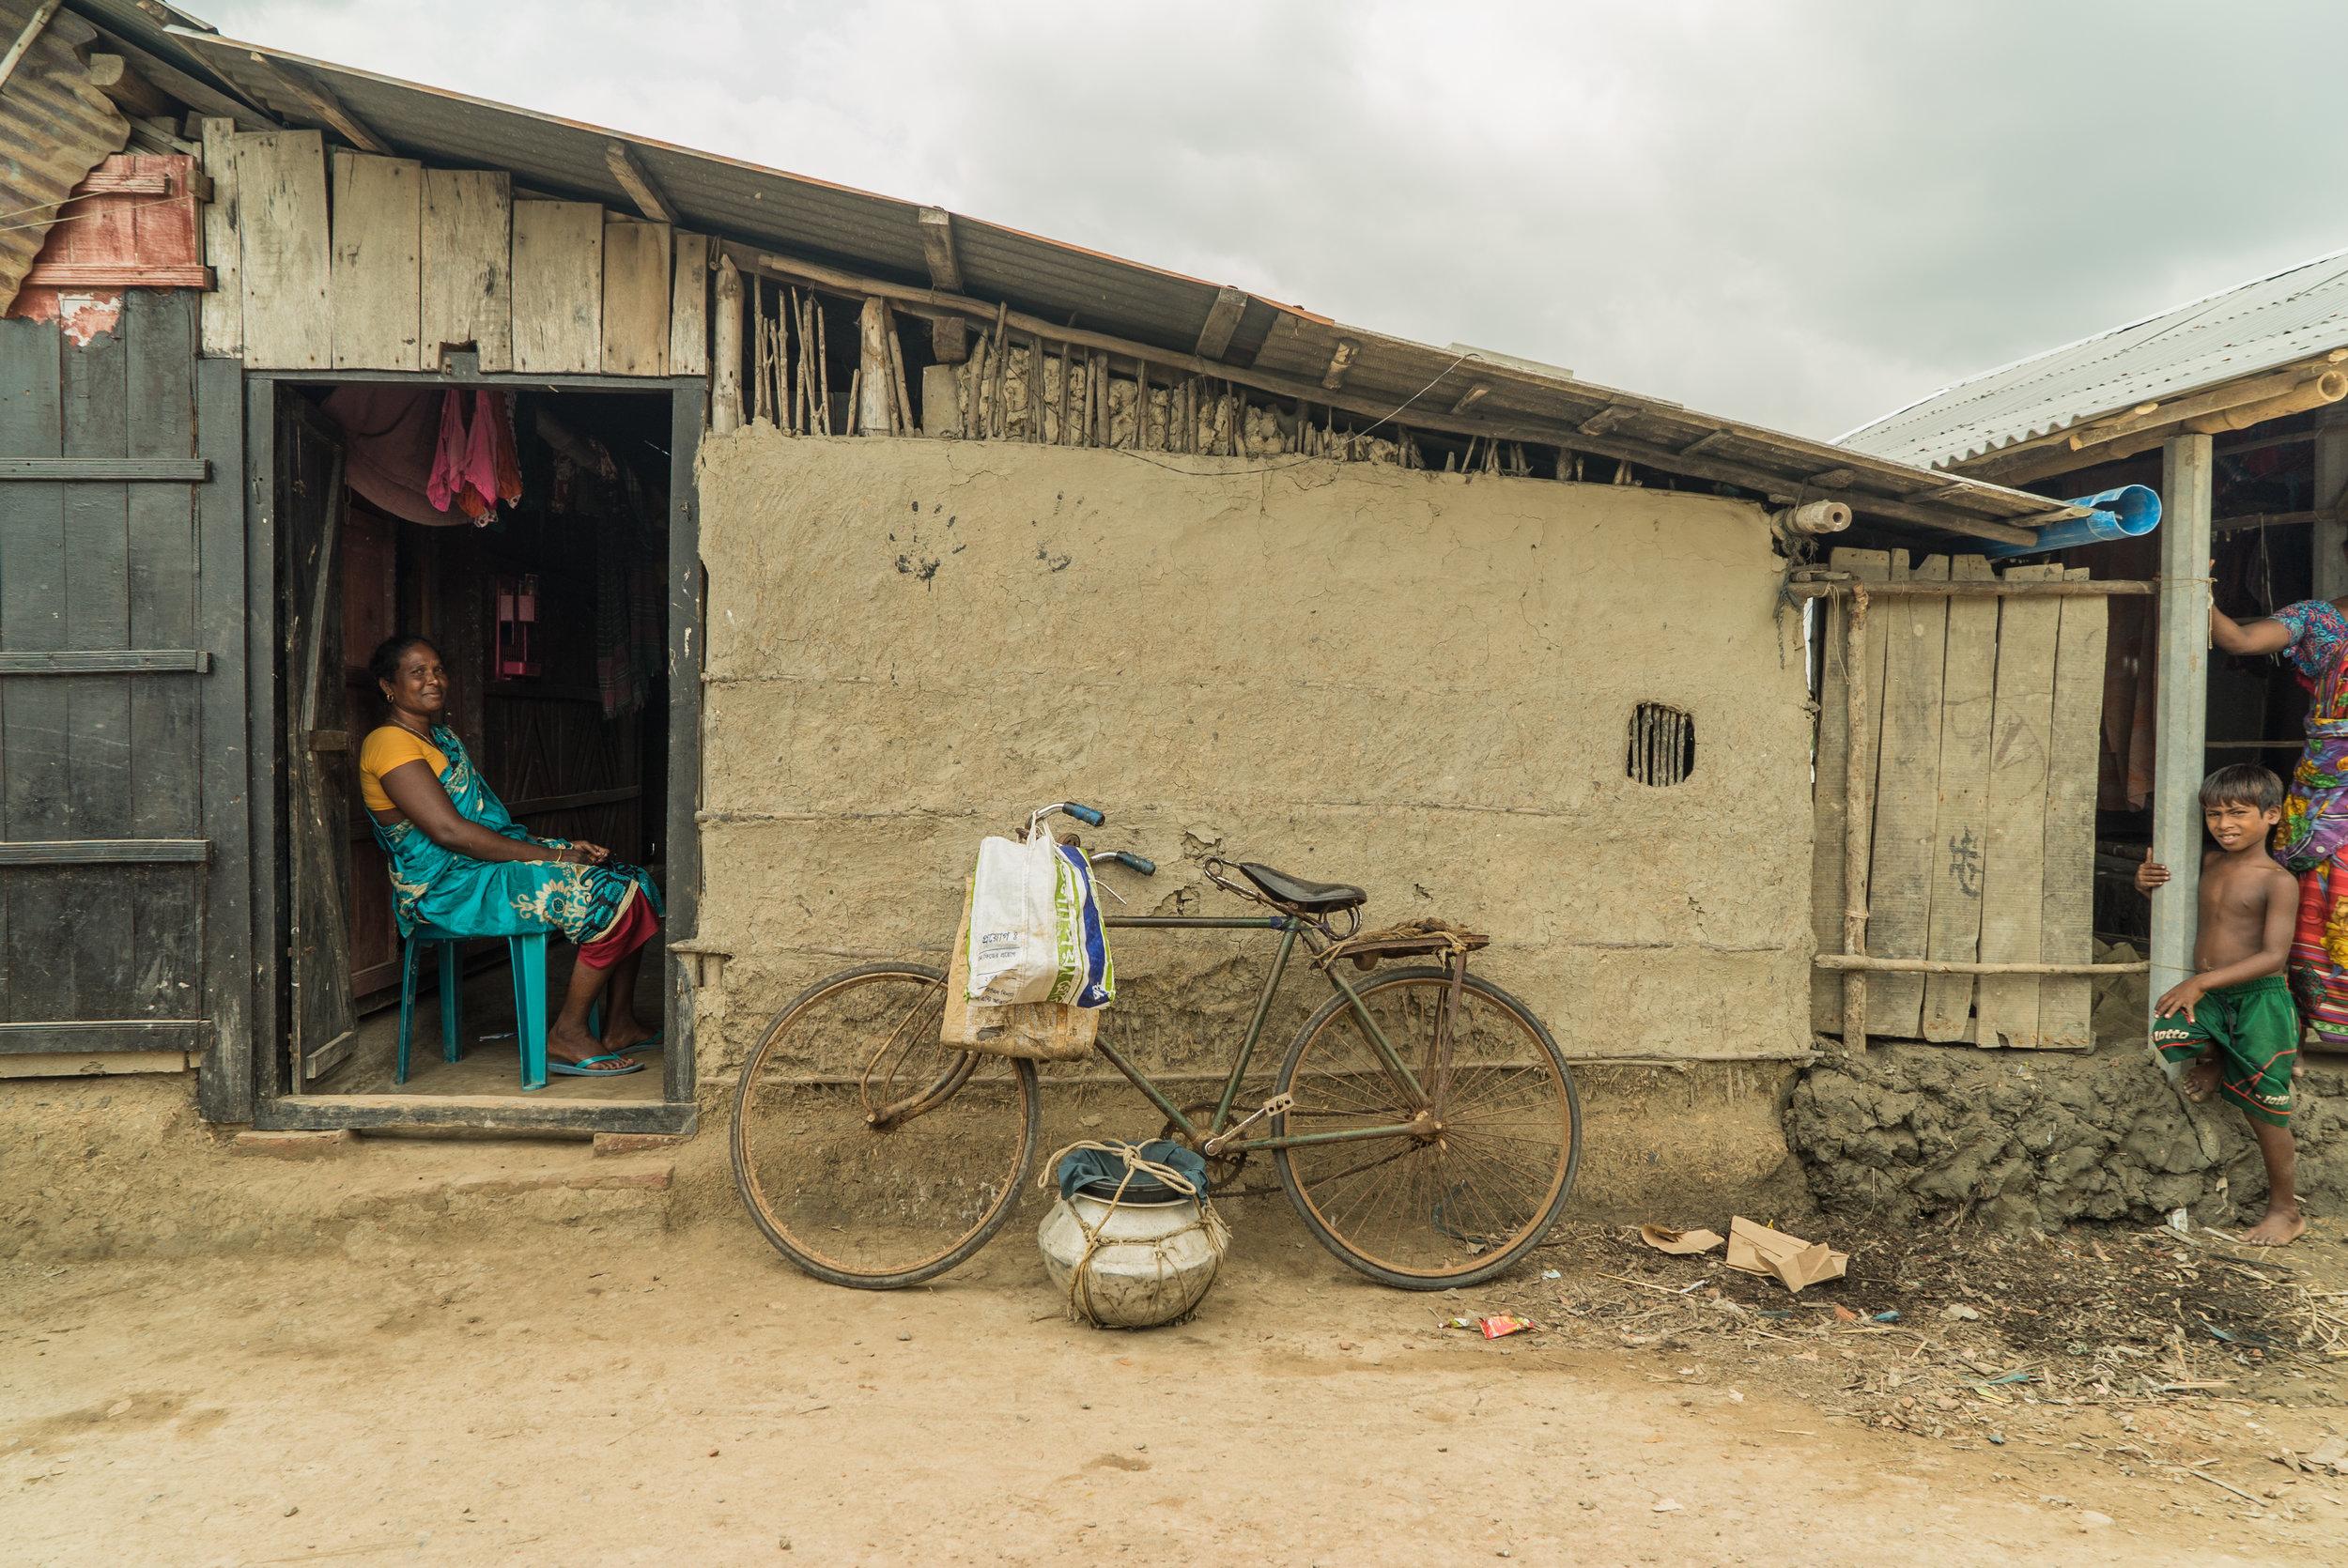 bangladesh-village-woman-portrait-Photo-by-Aaron-Minks-DSC05899.jpg